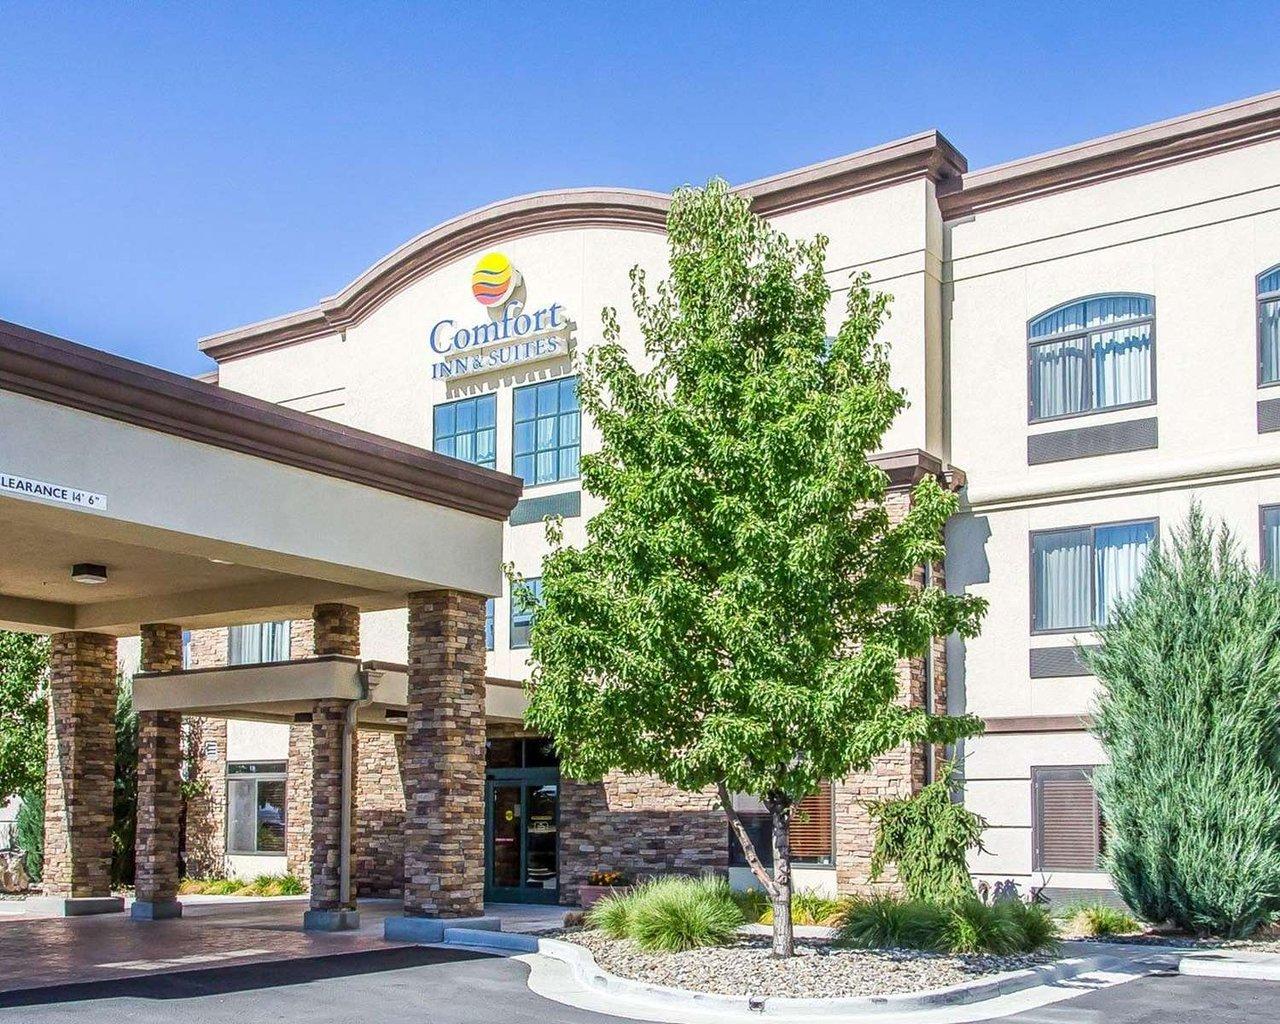 the 10 best hotels in twin falls id for 2019 from 71 tripadvisor rh tripadvisor com